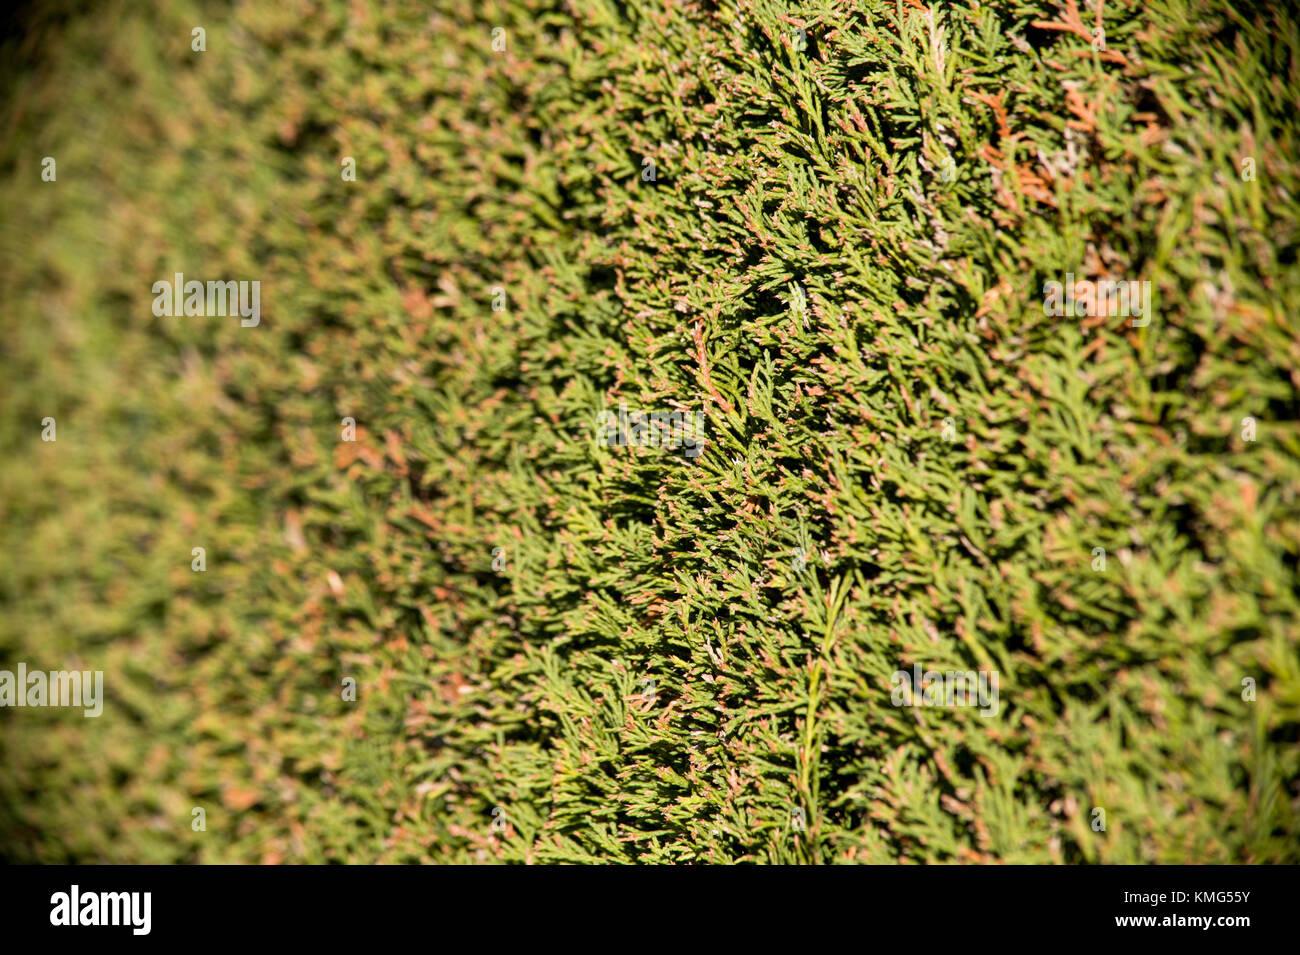 Yew hedge close up - Stock Image